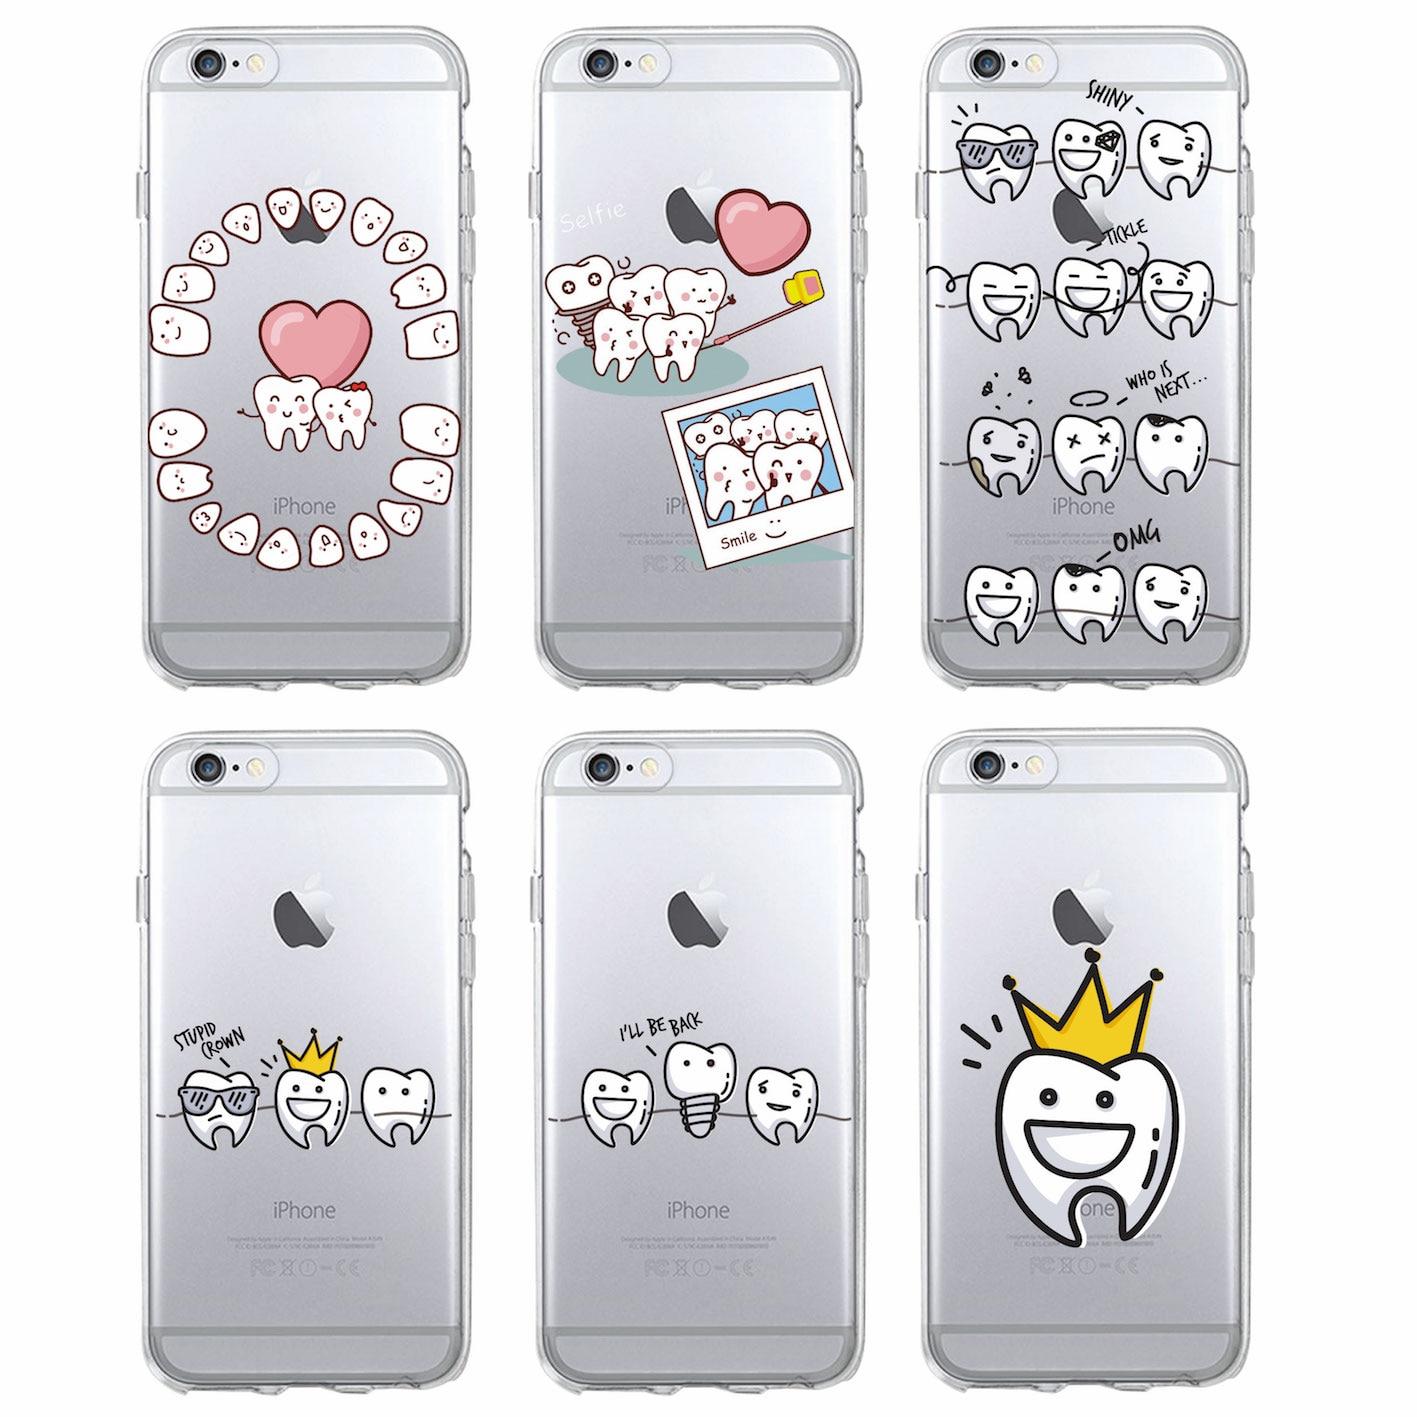 da8e3c7d70a Funda de teléfono suave de dibujos animados divertidos dentista dientes  corona funda para iPhone 7 7 Plus 6 6 S 5 5S 8 8 Plus X XS X Max SAMSUNG en  Cajas ...